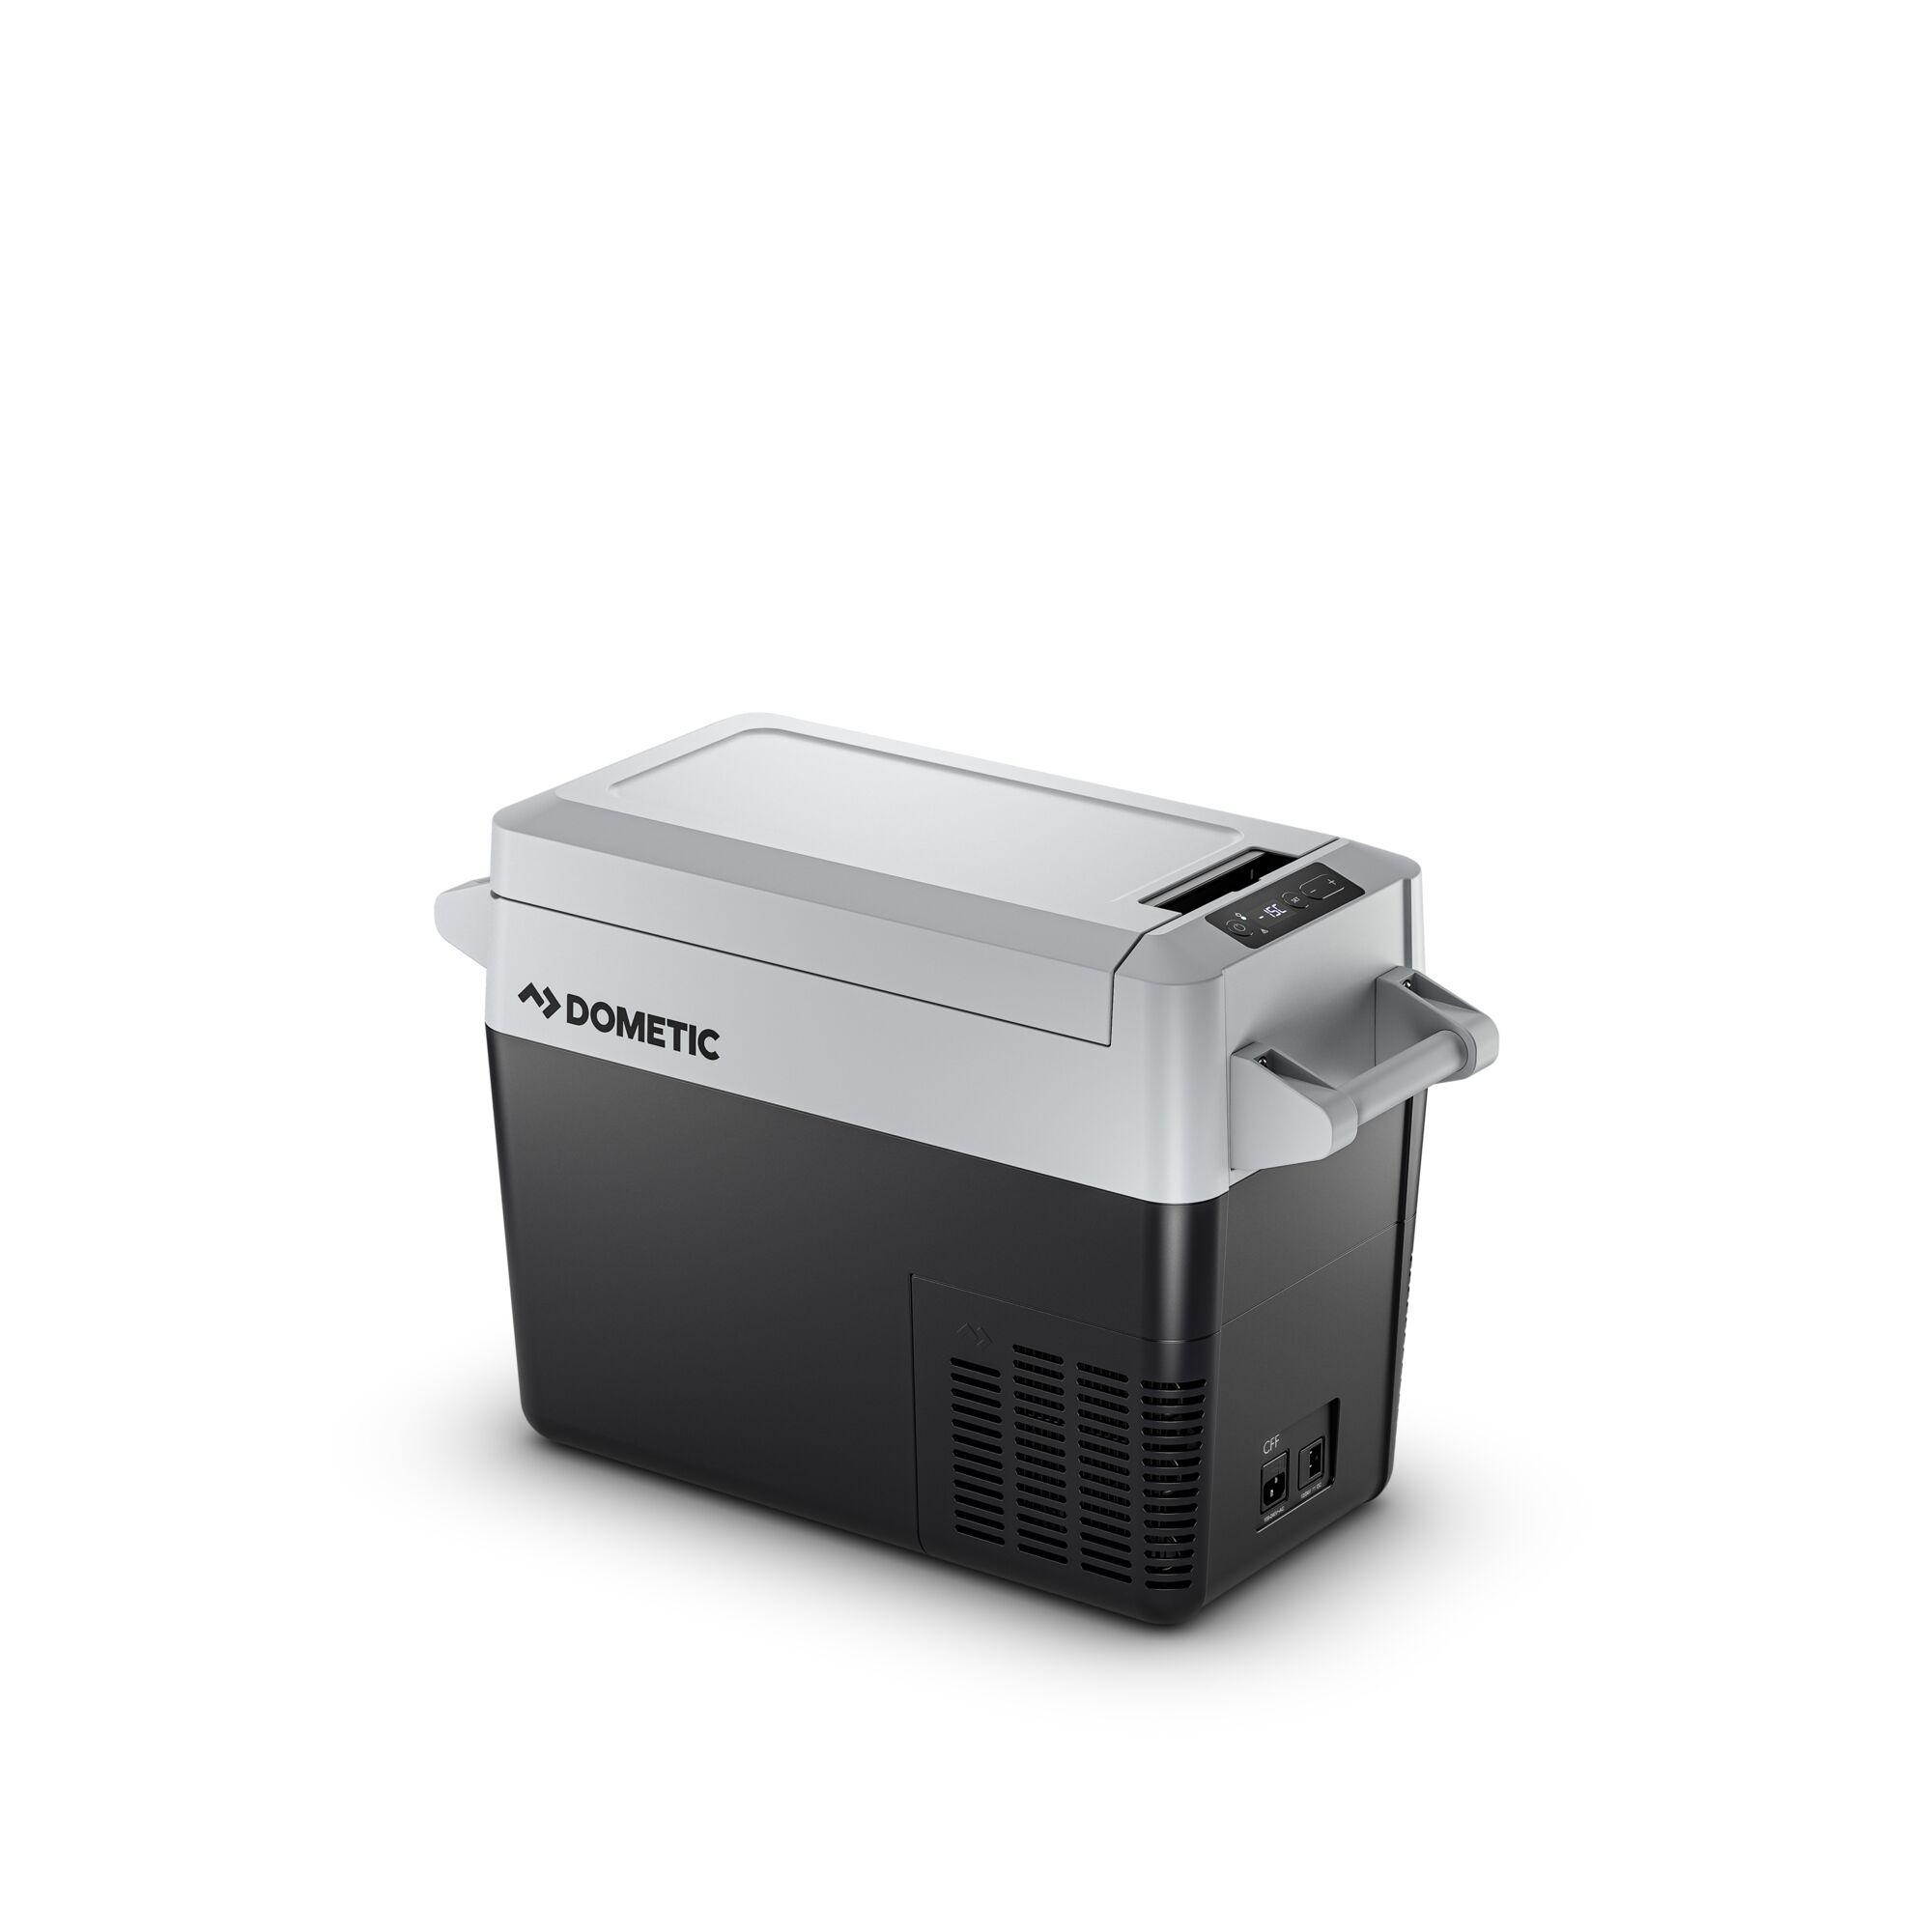 Dometic Waeco CoolFreeze CFF20 AC/DC Kompressor Kühlbox Kühltruhe 12 24V EEK C